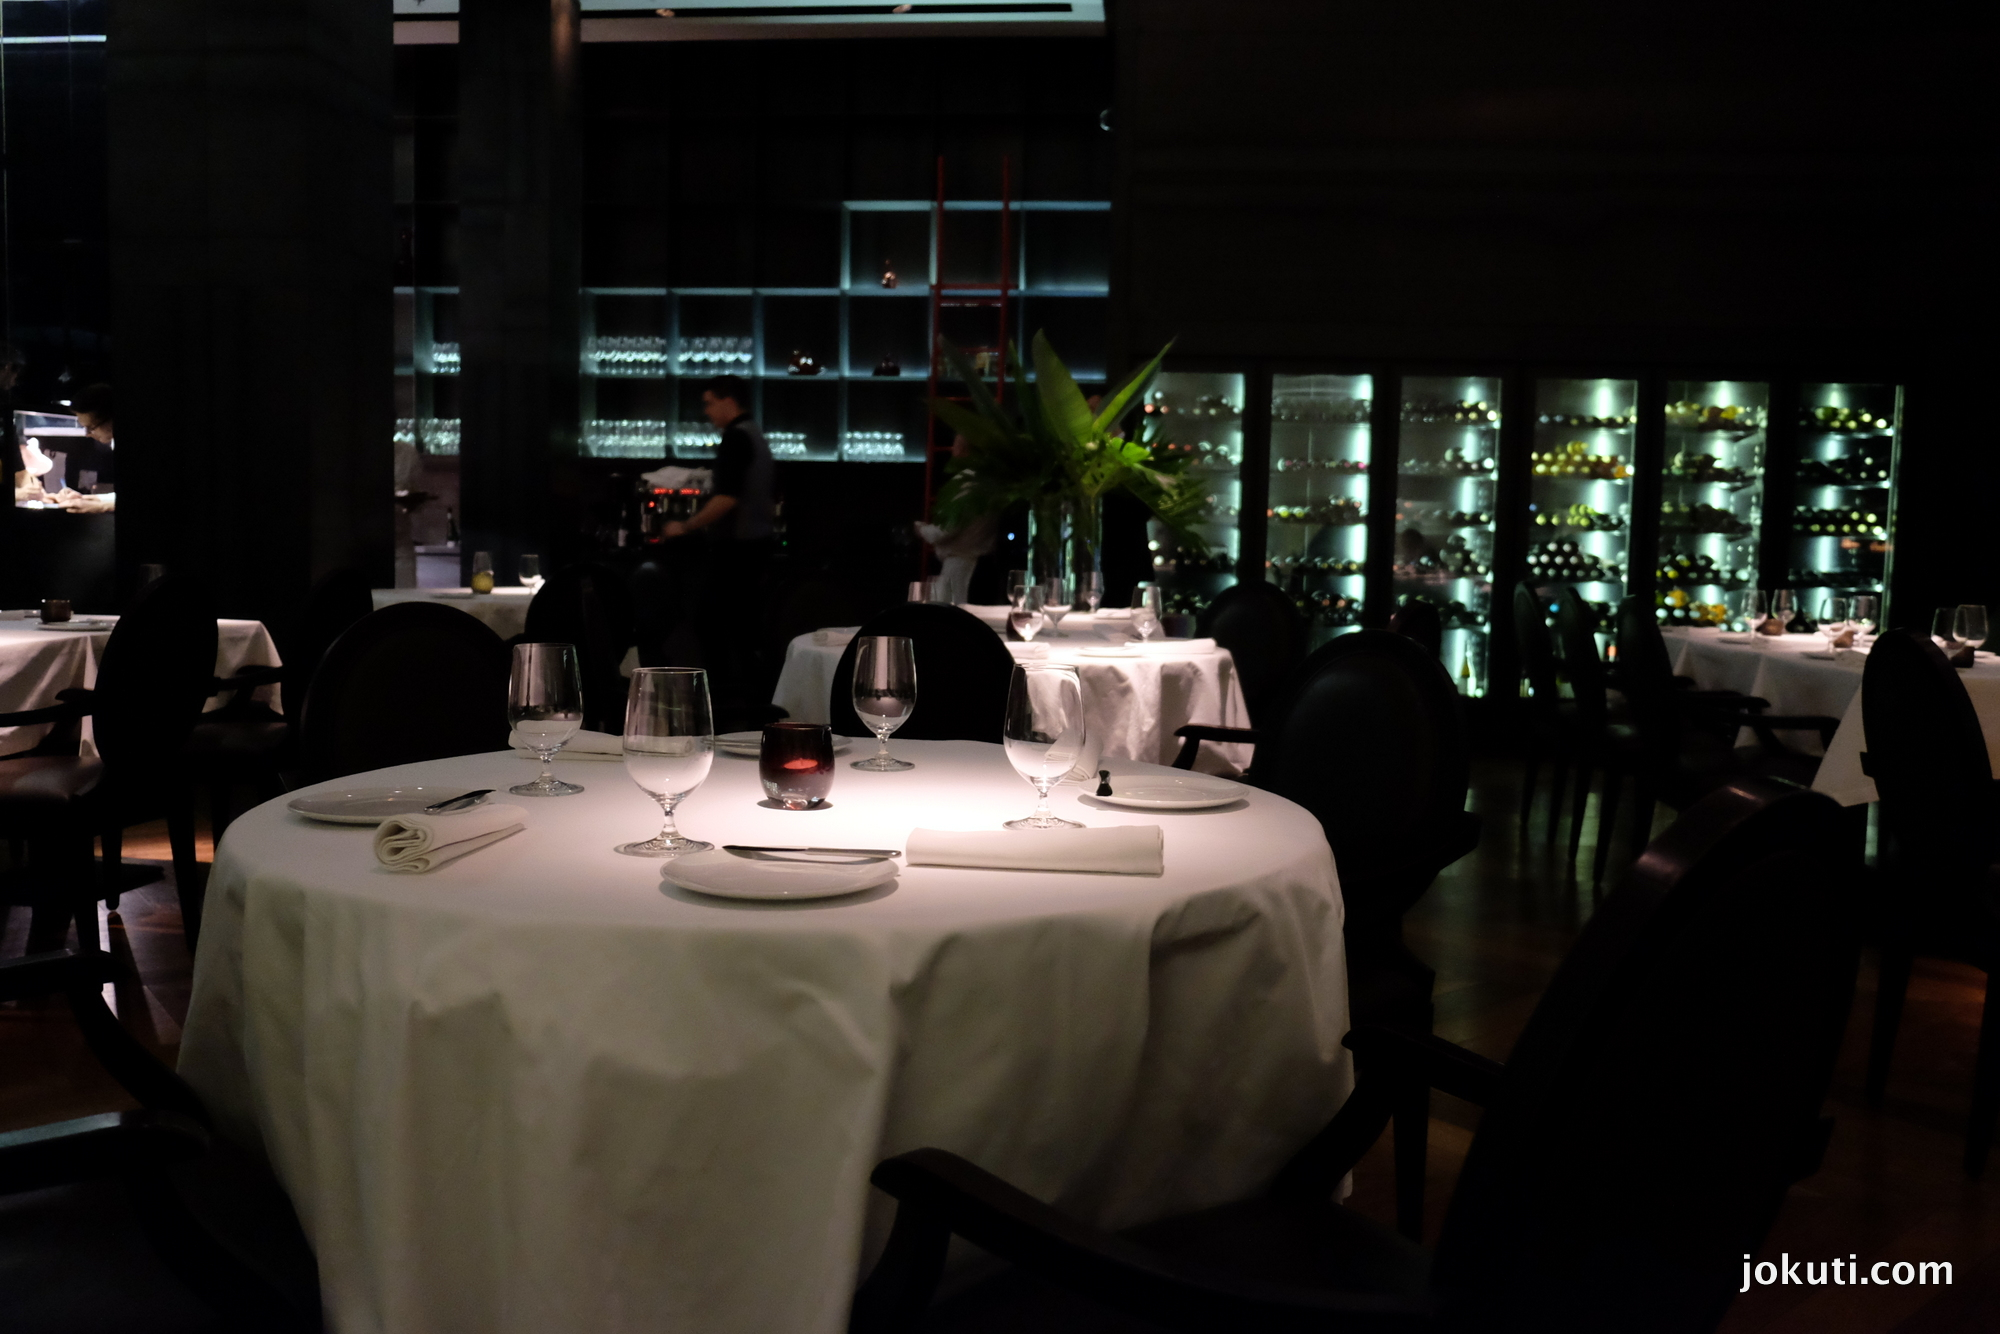 dscf5332_baraka_budapest_hungary_restaurant_vilagevo_jokuti.jpg